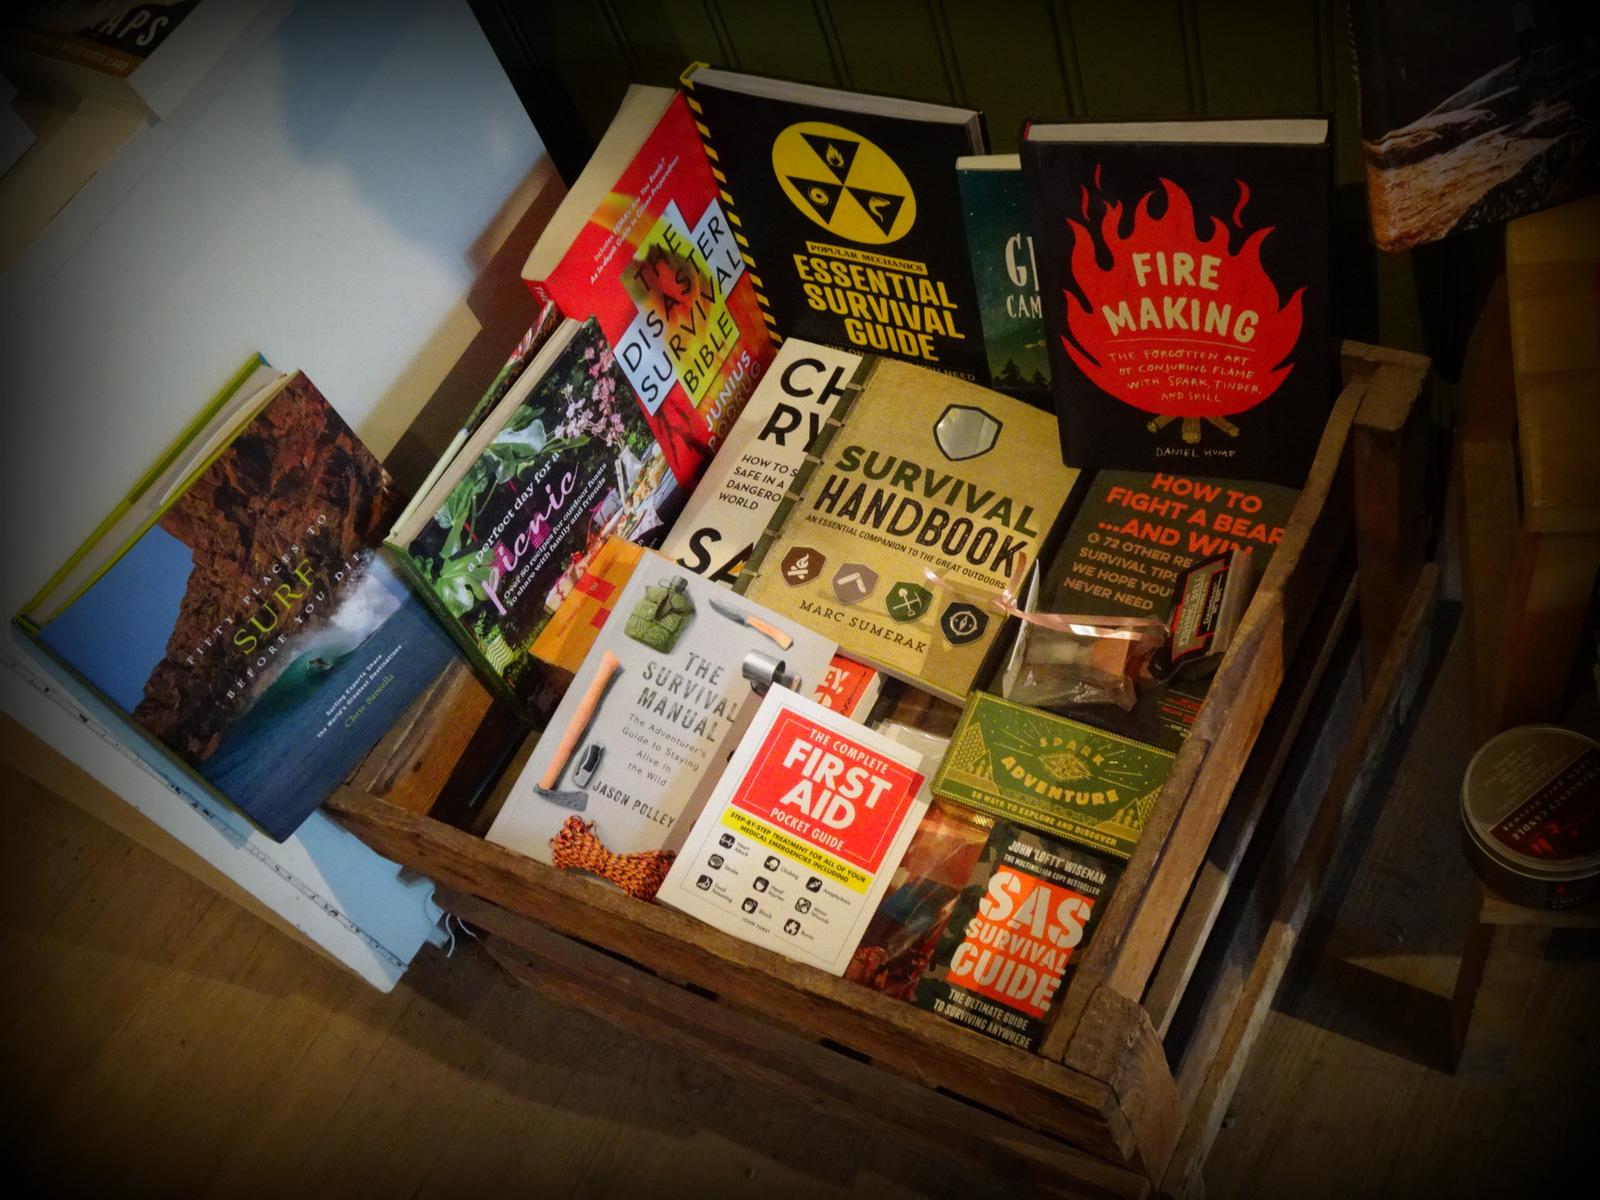 Cafe Books survival books